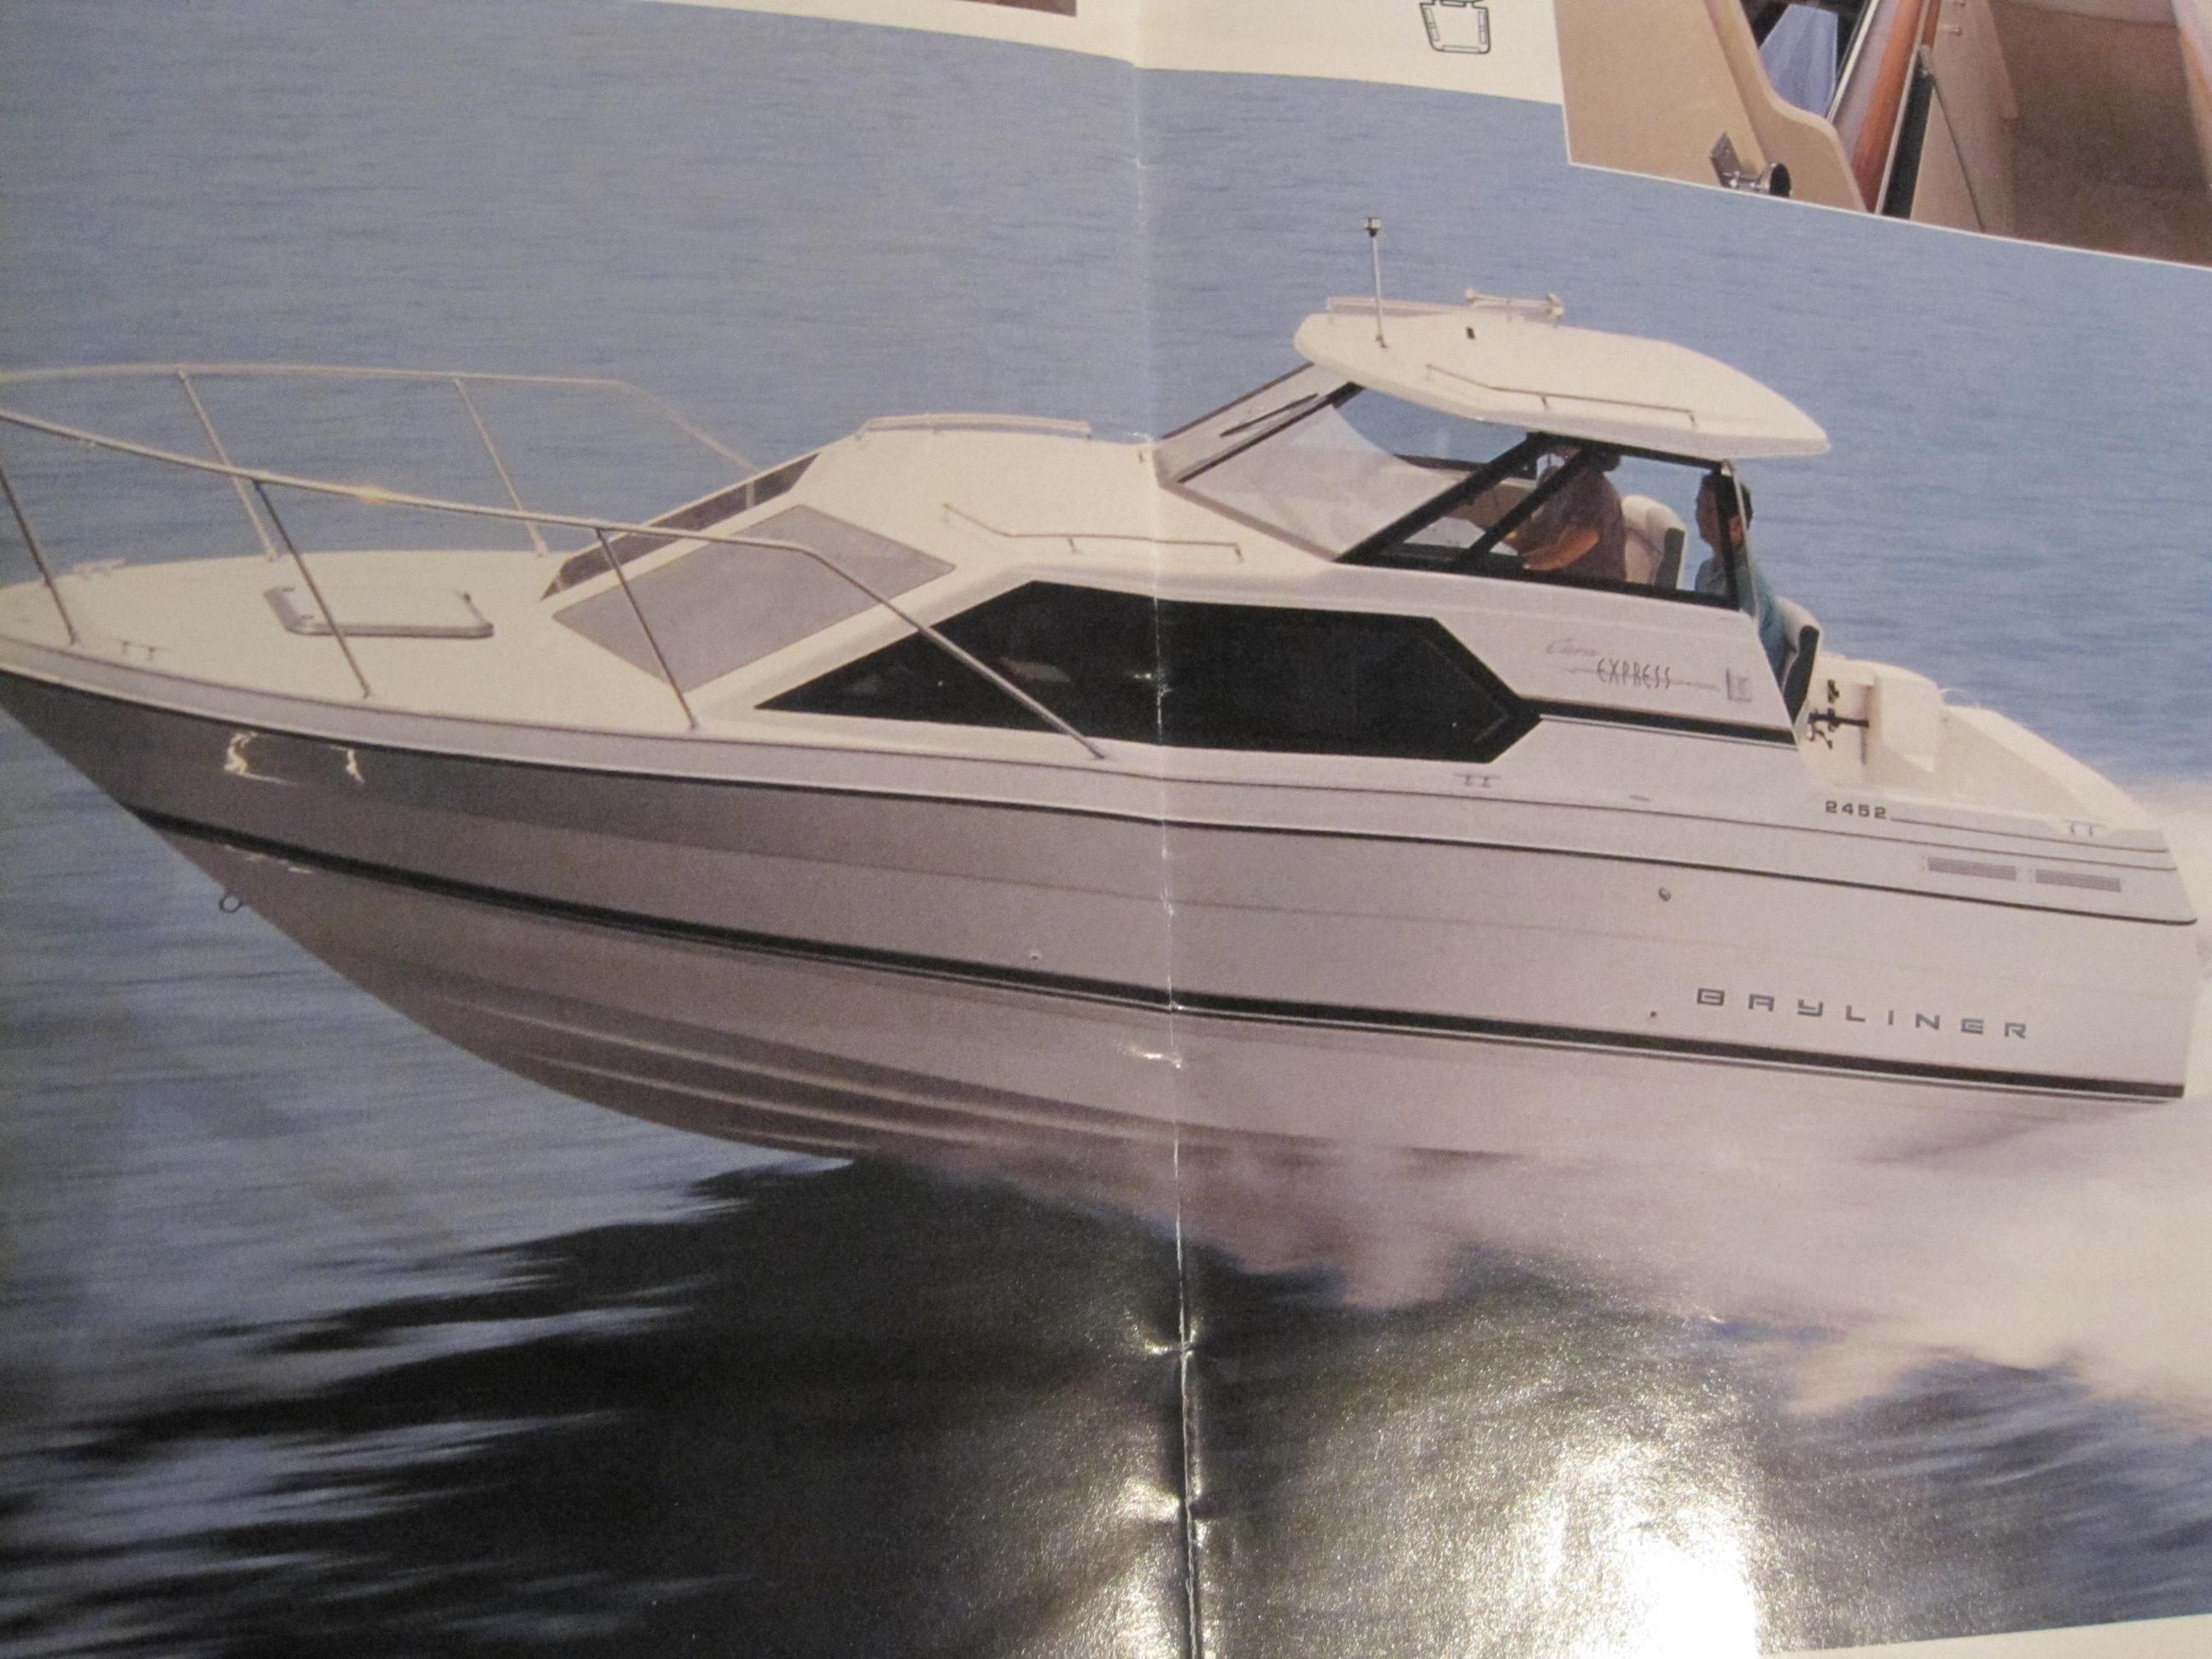 1996 Bayliner 2452 Ciera Classic Power Boat For Sale - www.yachtworld.com